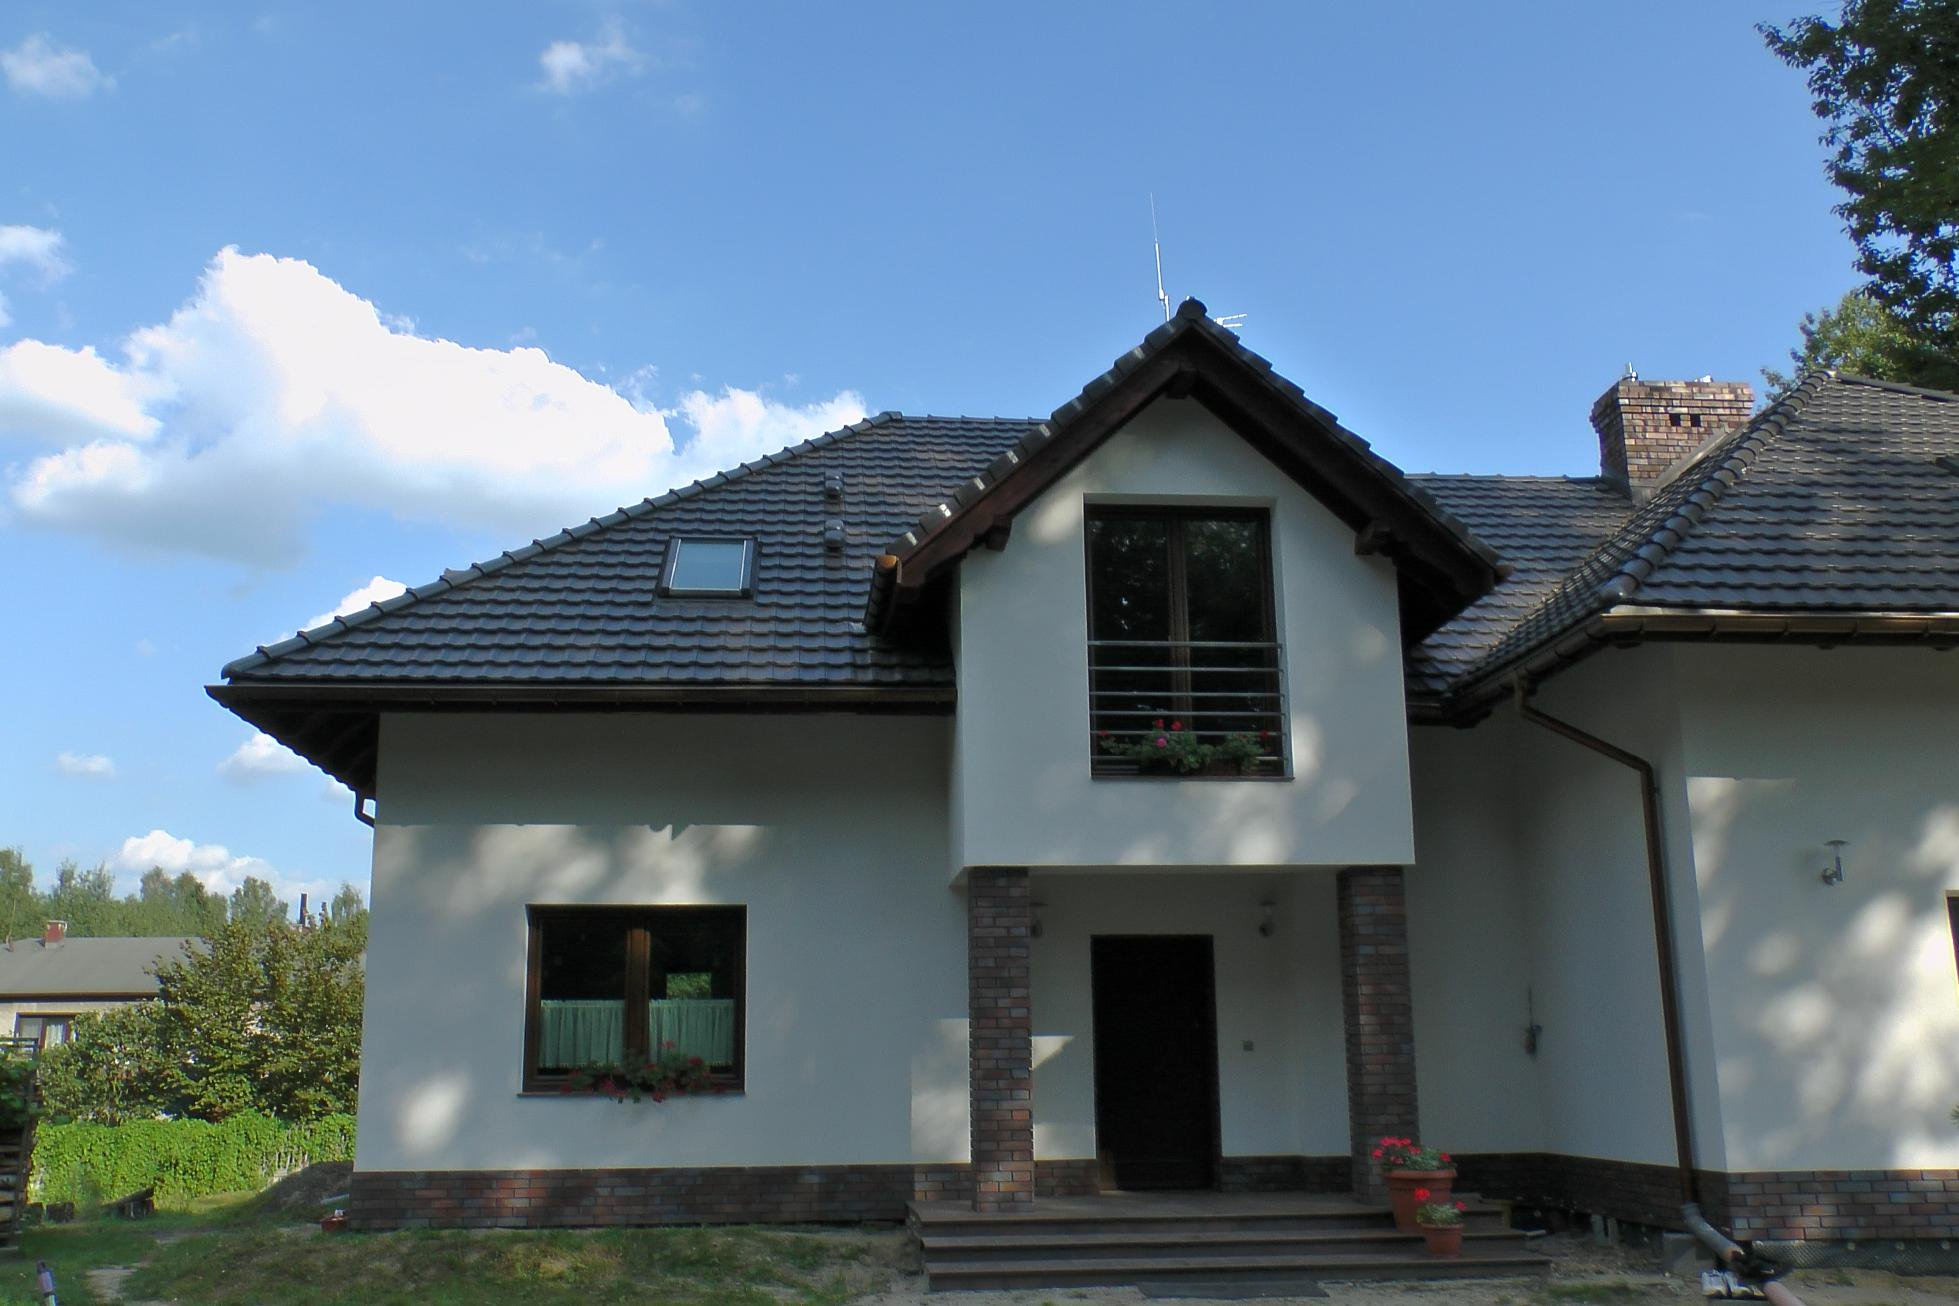 ewa-piotrowska-1375810561_4-1385122164-wqlo_04g.jpg